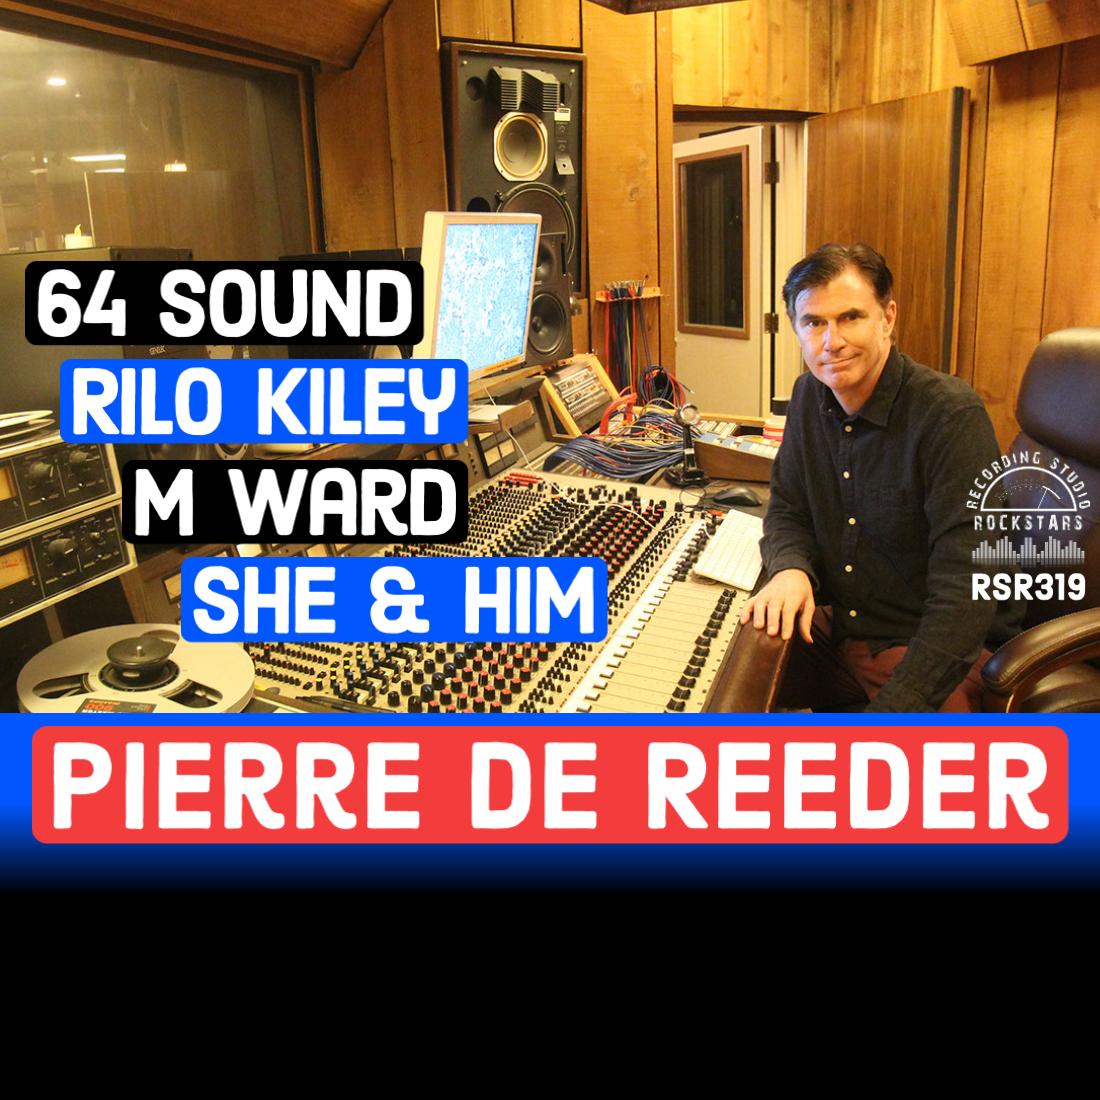 RSR319 - Pierre de Reeder - 64 Sound, Rilo Kiley, M Ward, She & Him